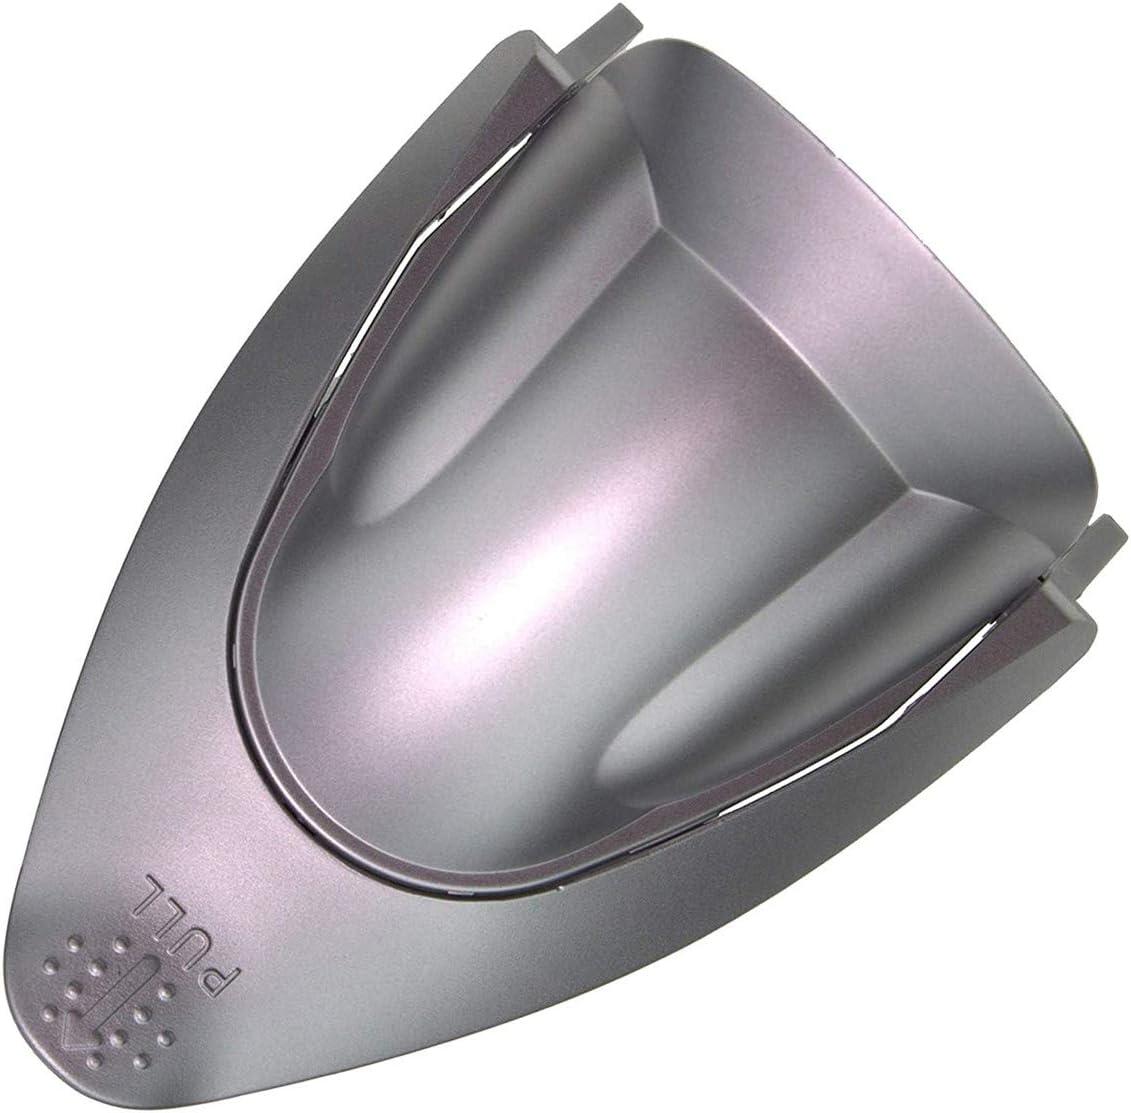 Rowenta Tapa palanca apertura filtro aspirador Air Force 360 RH73 RH90: Amazon.es: Hogar